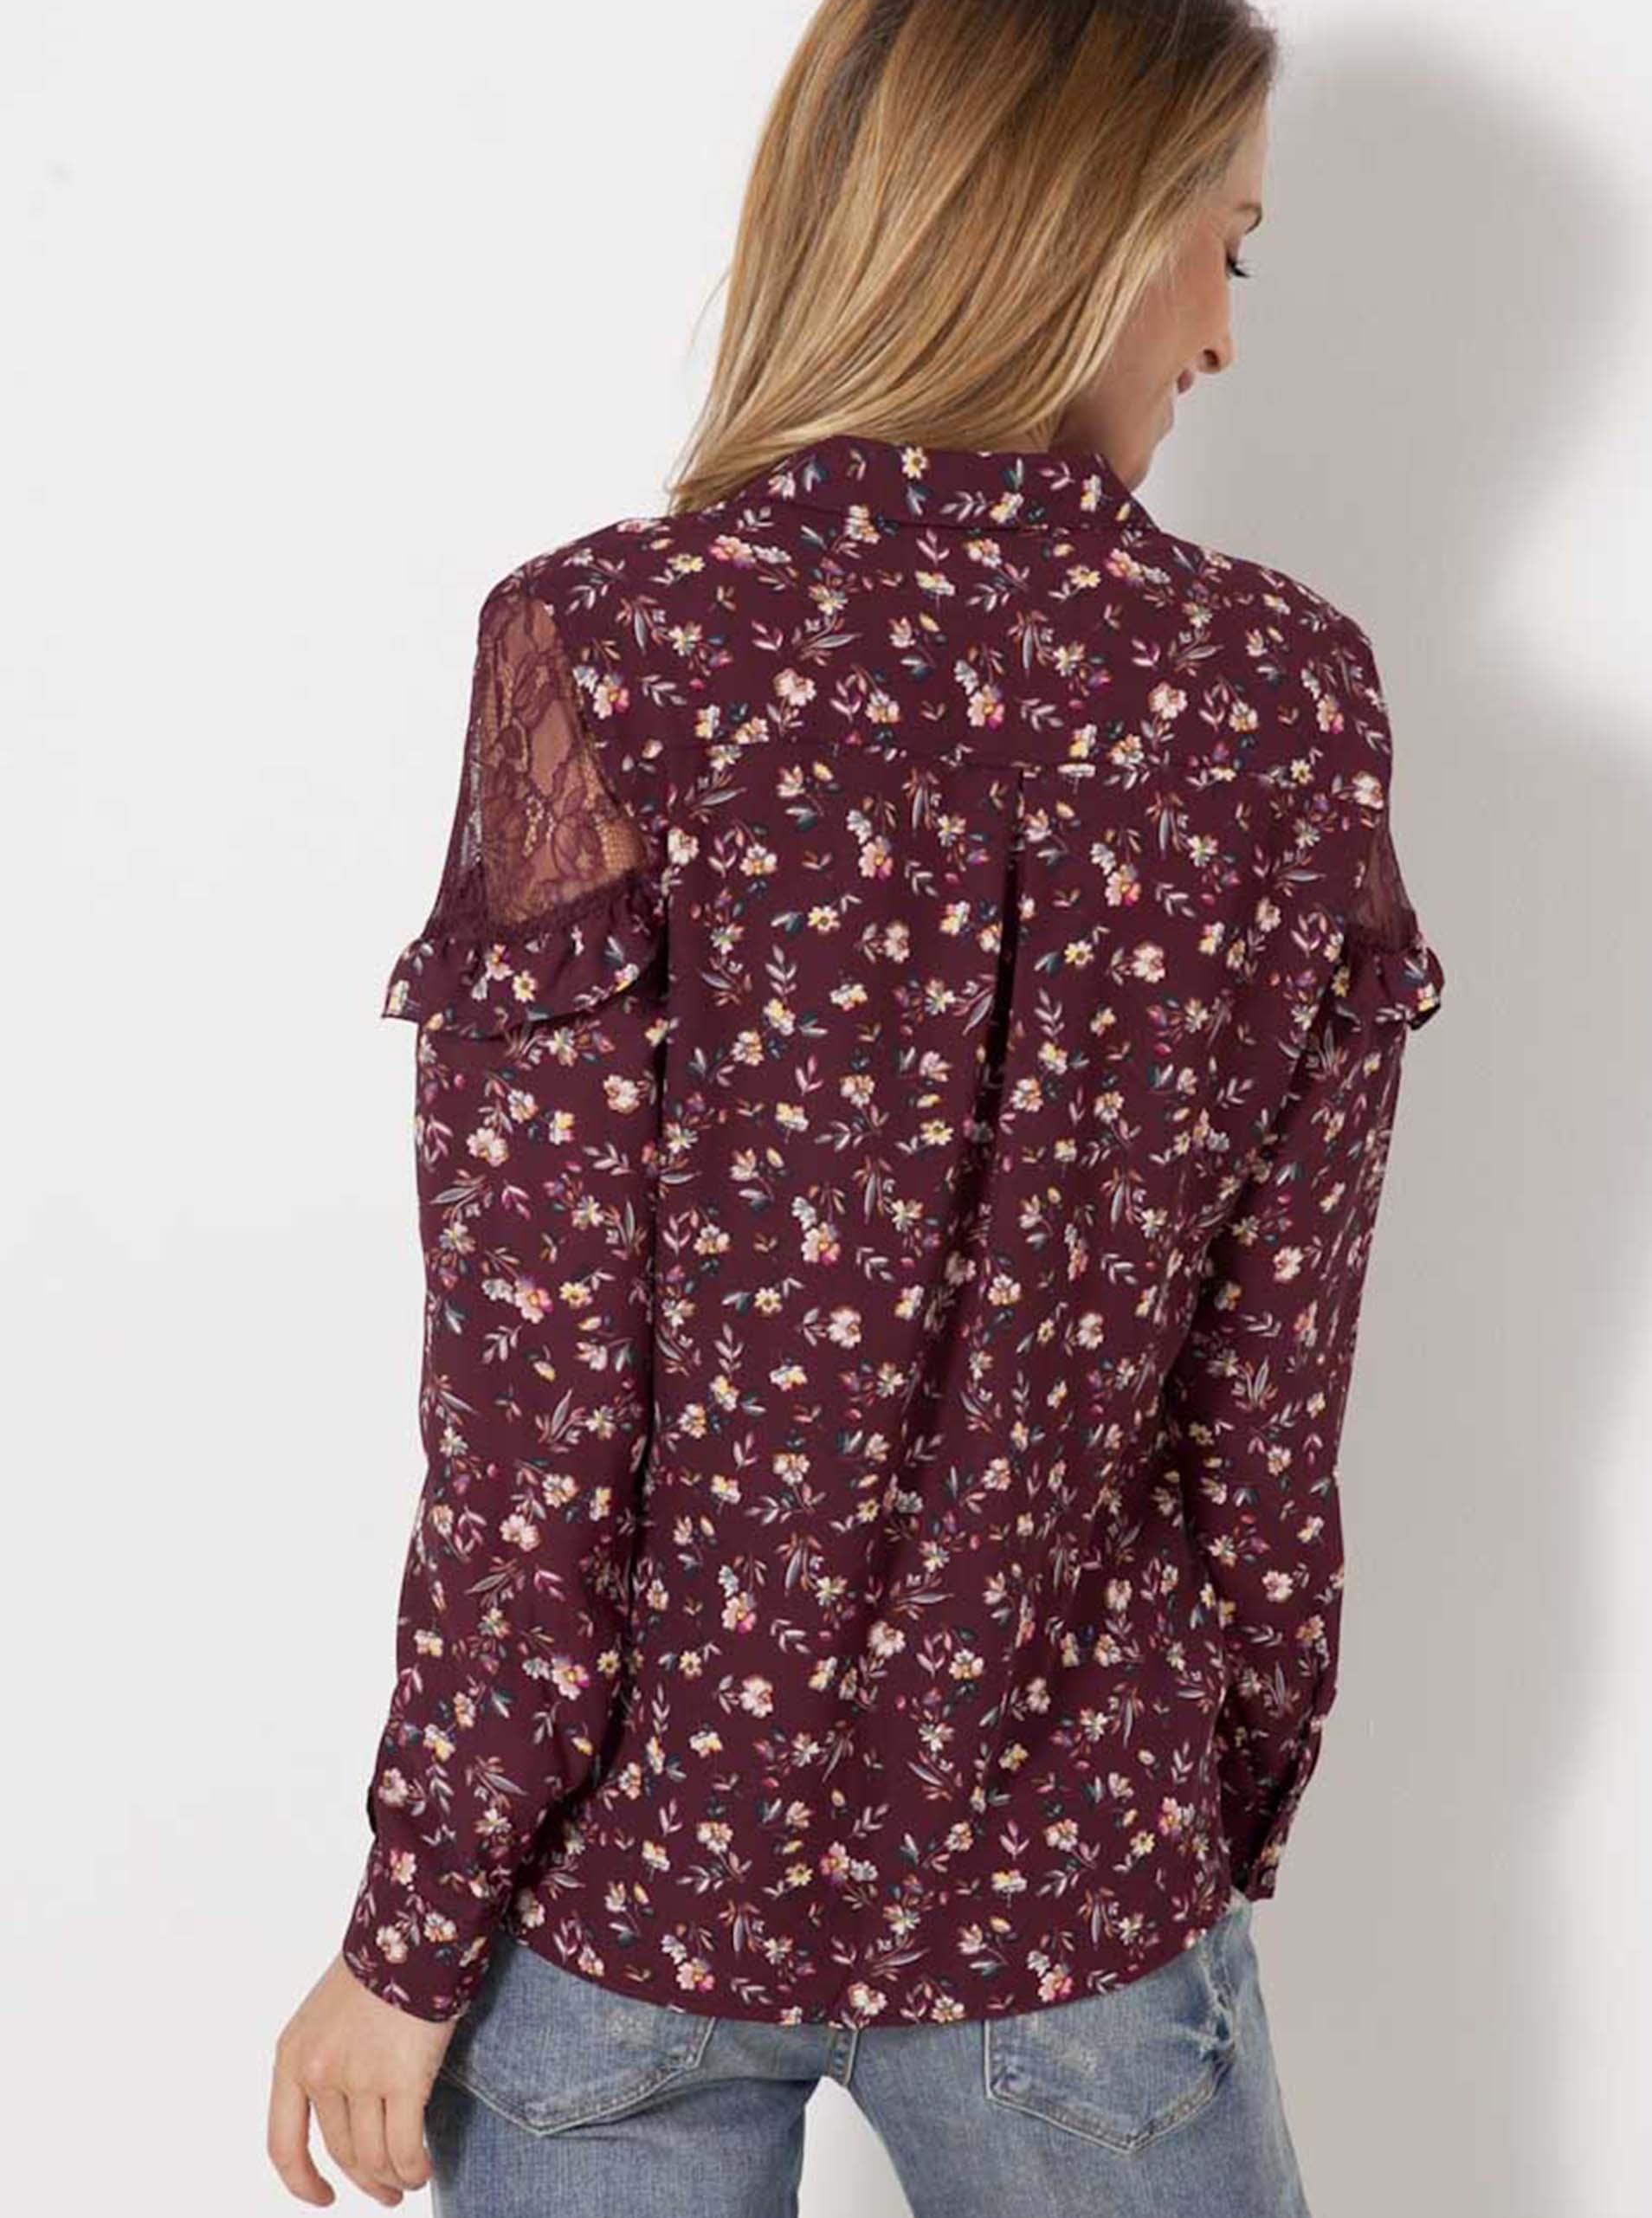 CAMAIEU Women's blouse wine red